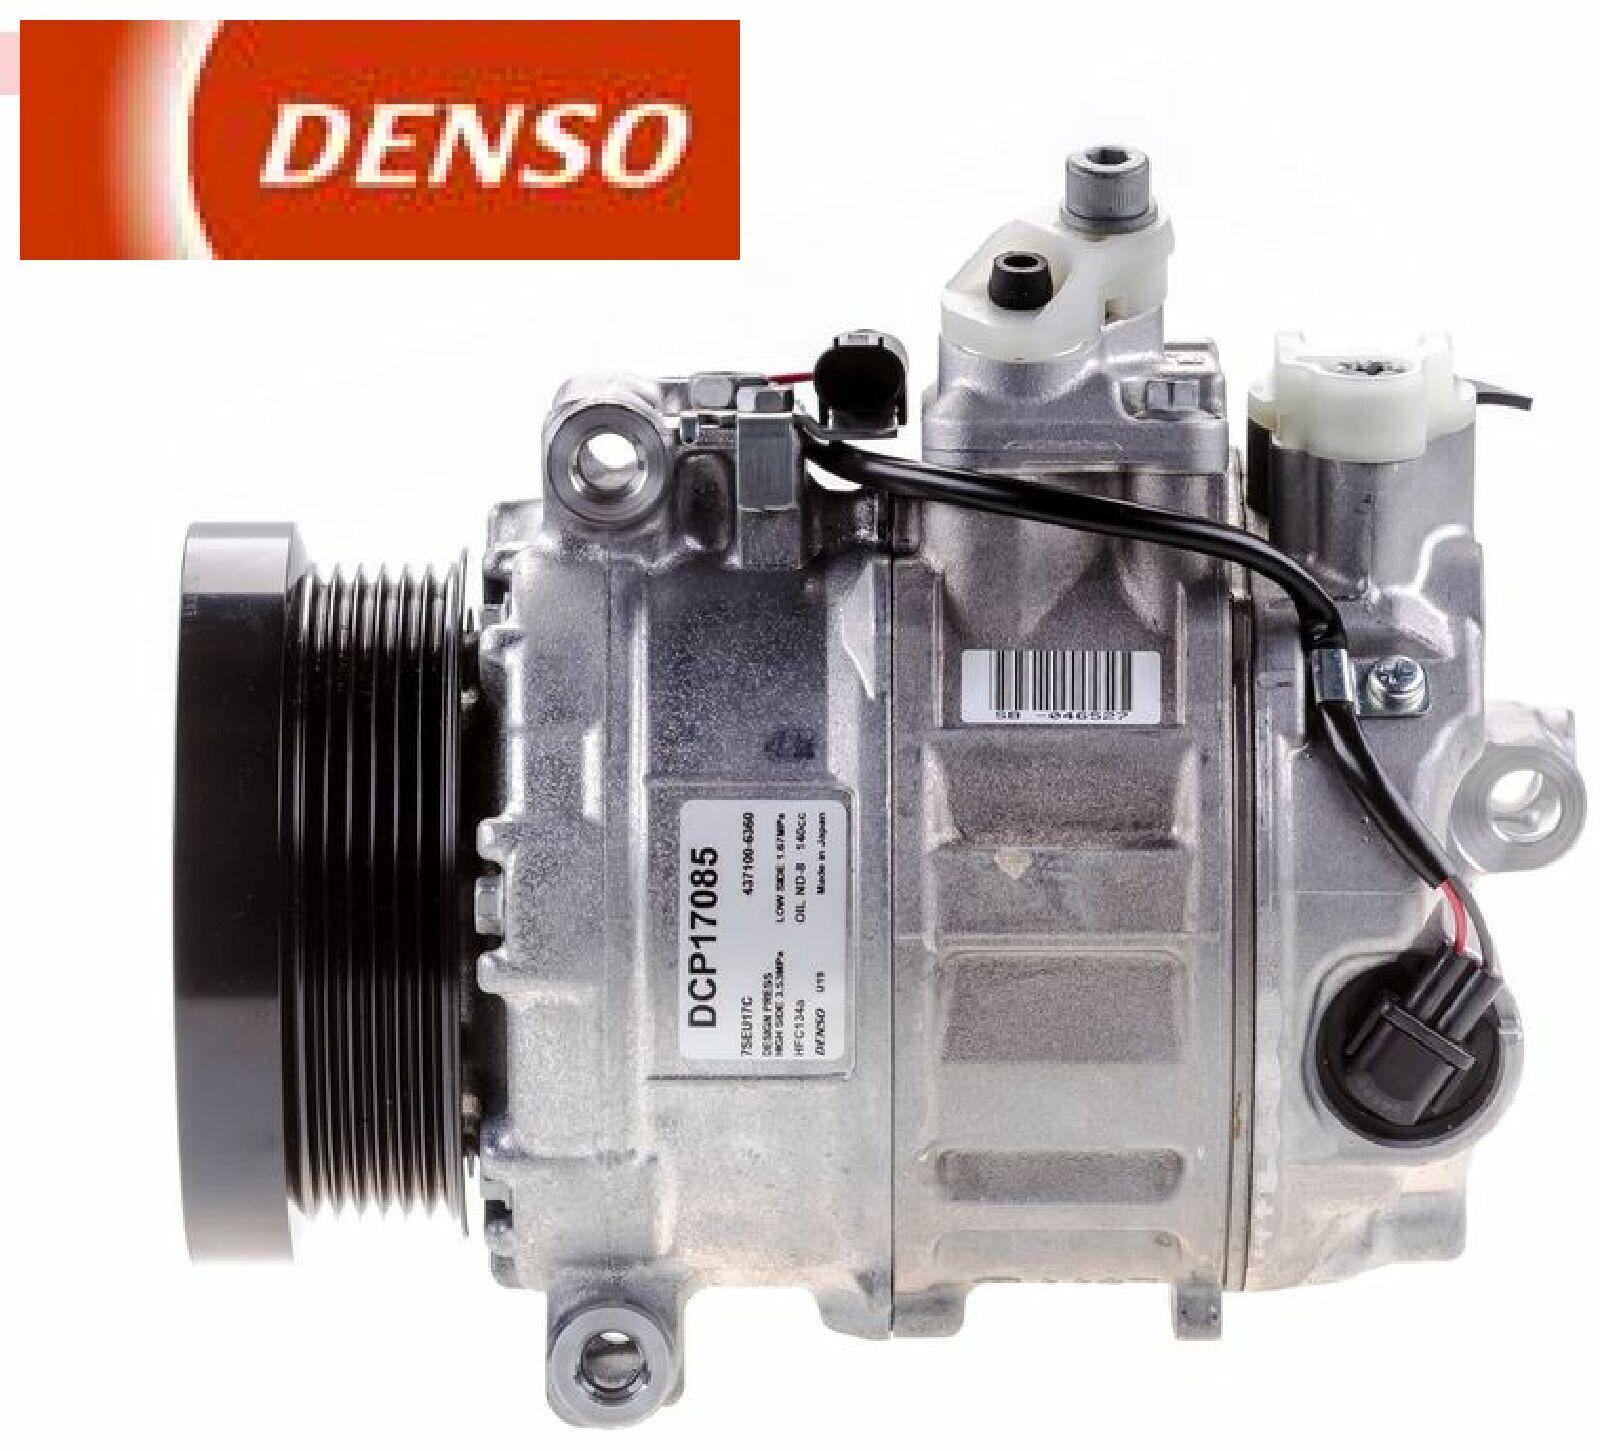 Denso Klimakompressor Kompressor Klima Dcp40004 Ebay Kompresor Vw Polo Das Bild Wird Geladen